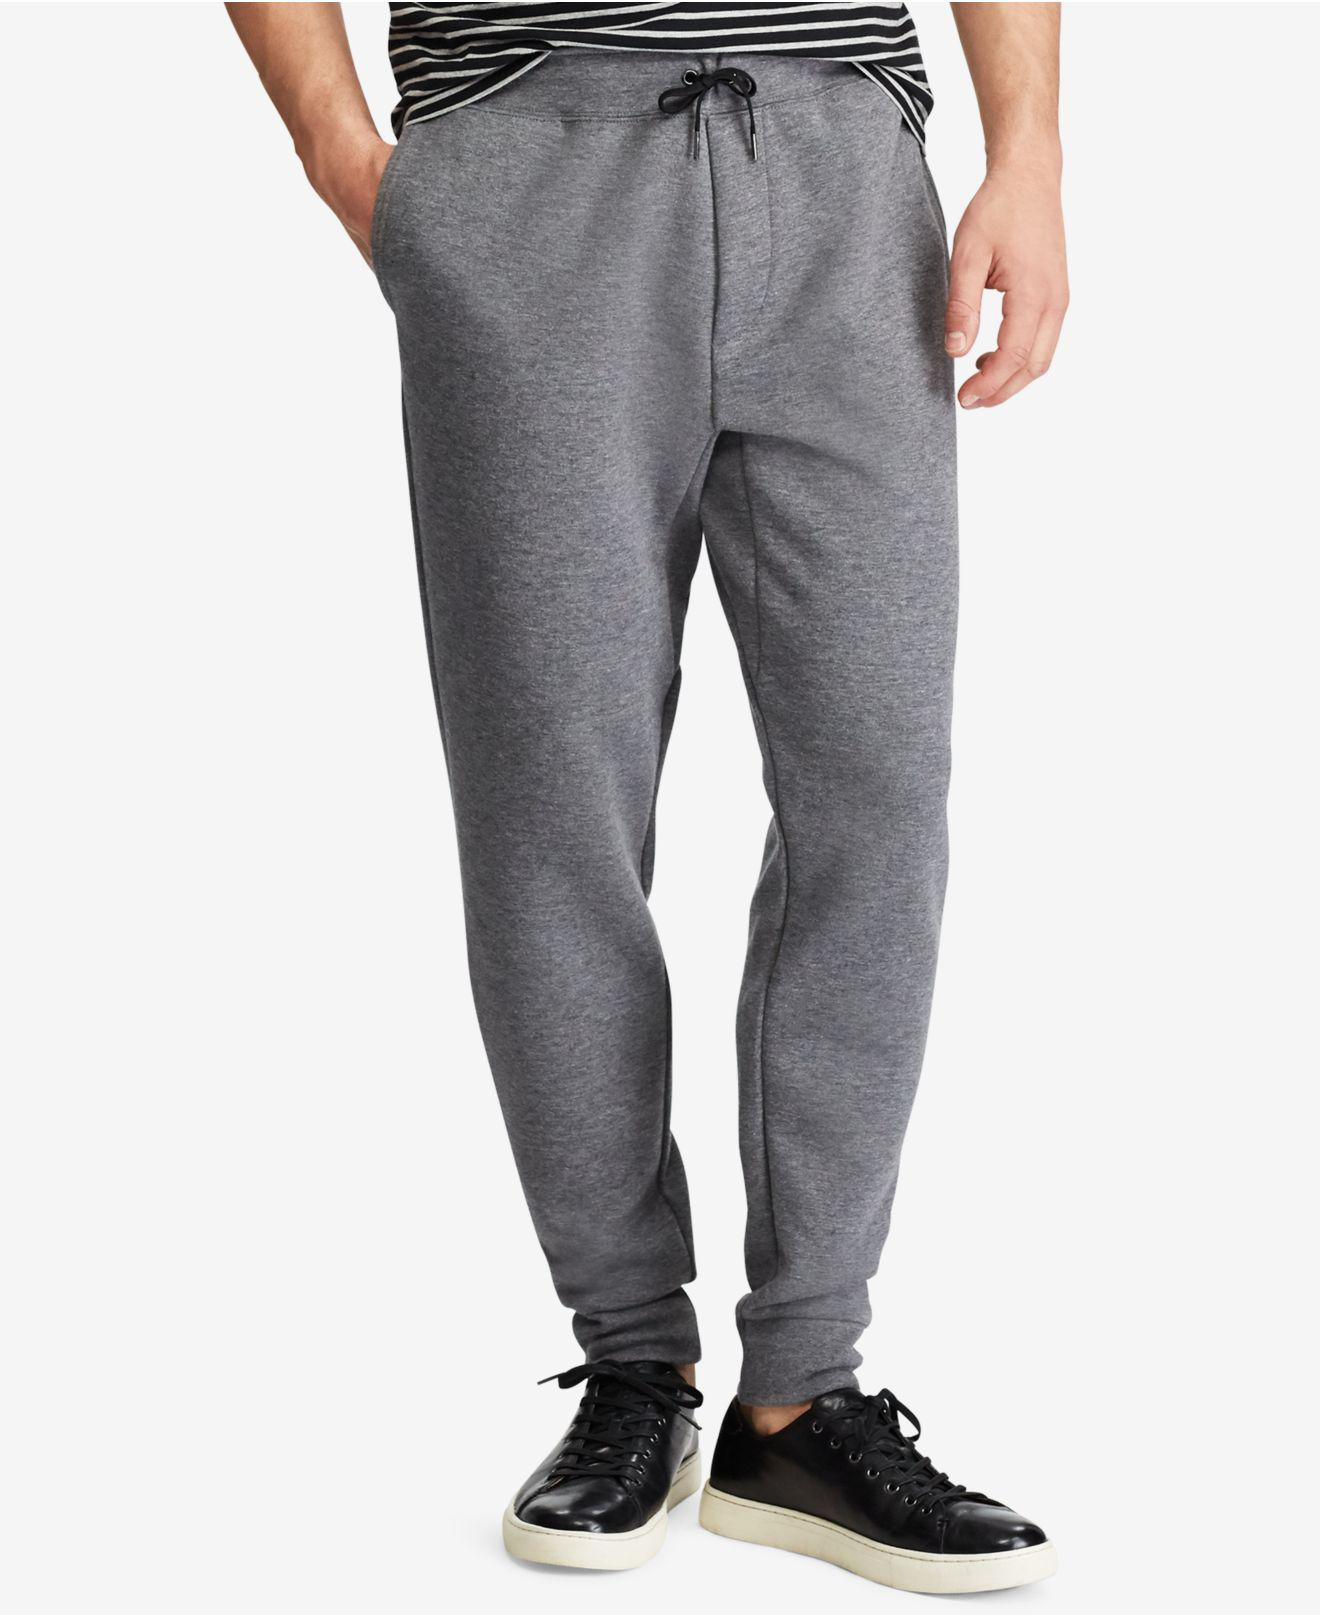 07a5837b1a7 Lyst - Polo Ralph Lauren Men s Big   Tall Double-knit Jogger Pants ...